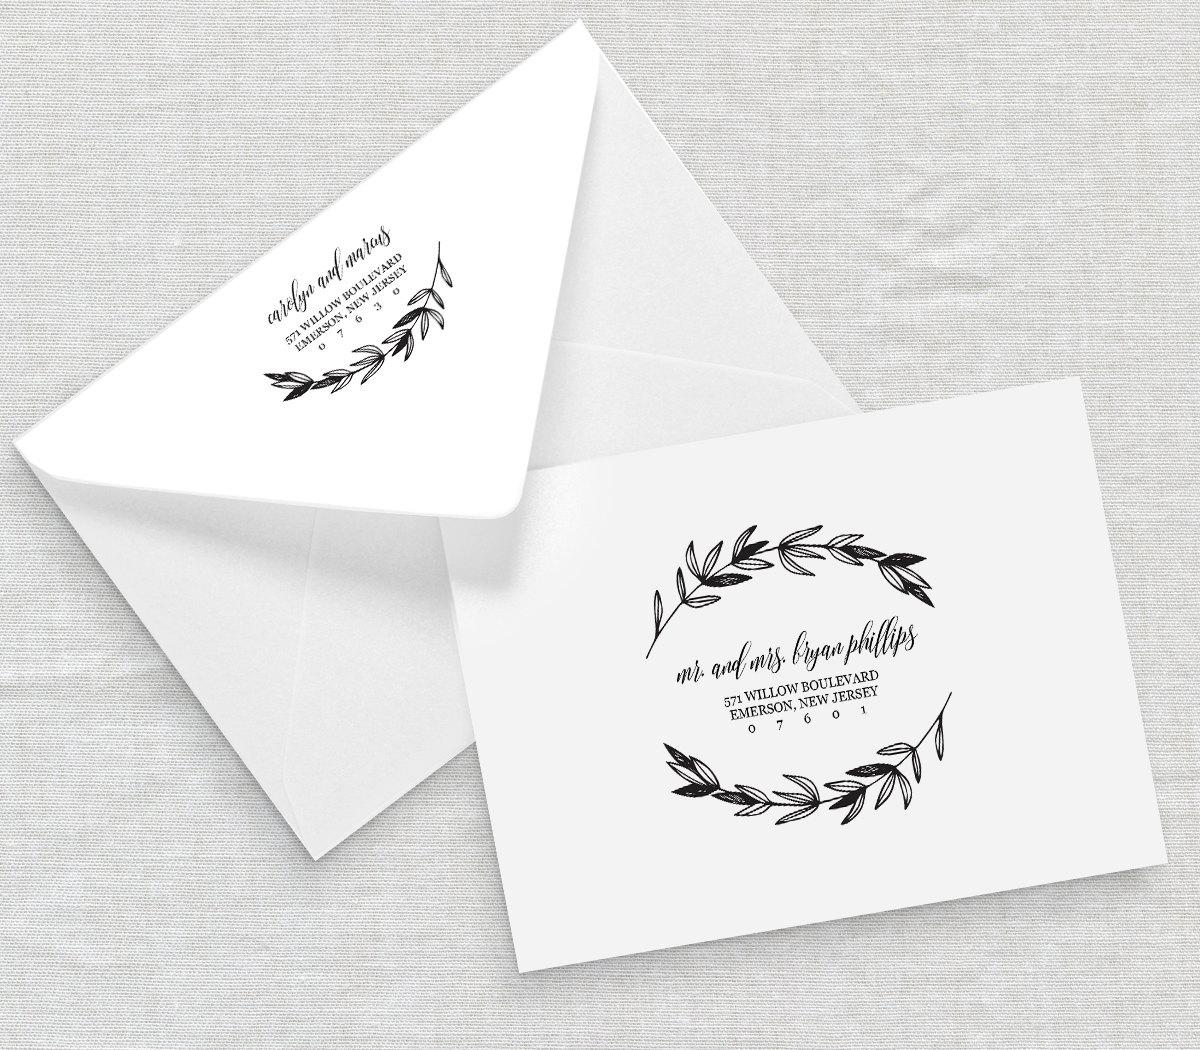 Rustic wedding calligraphy envelope addressing template diy